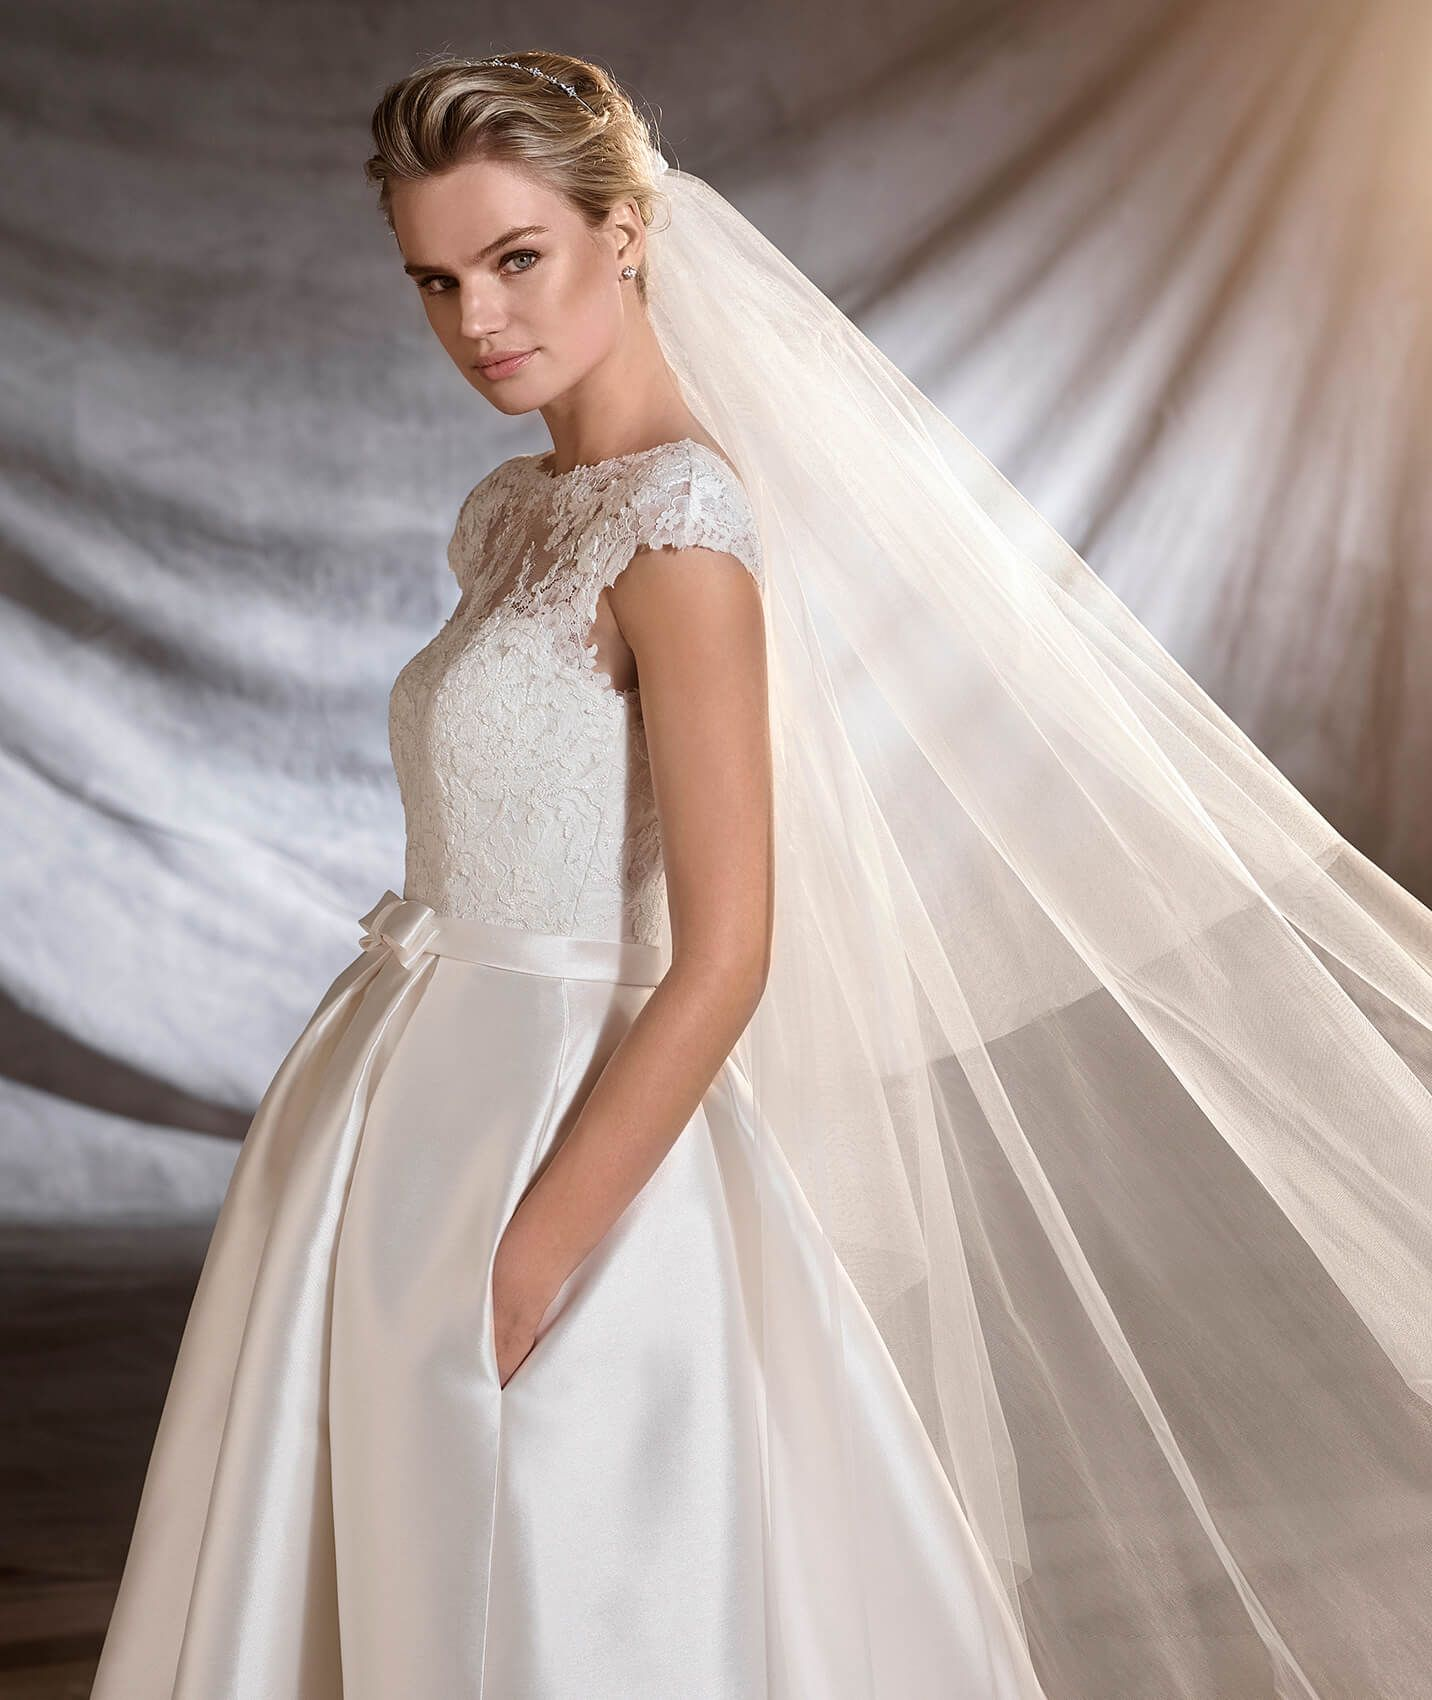 OSASUN - Wedding dress in mikado, tulle and lace. | Pronovias